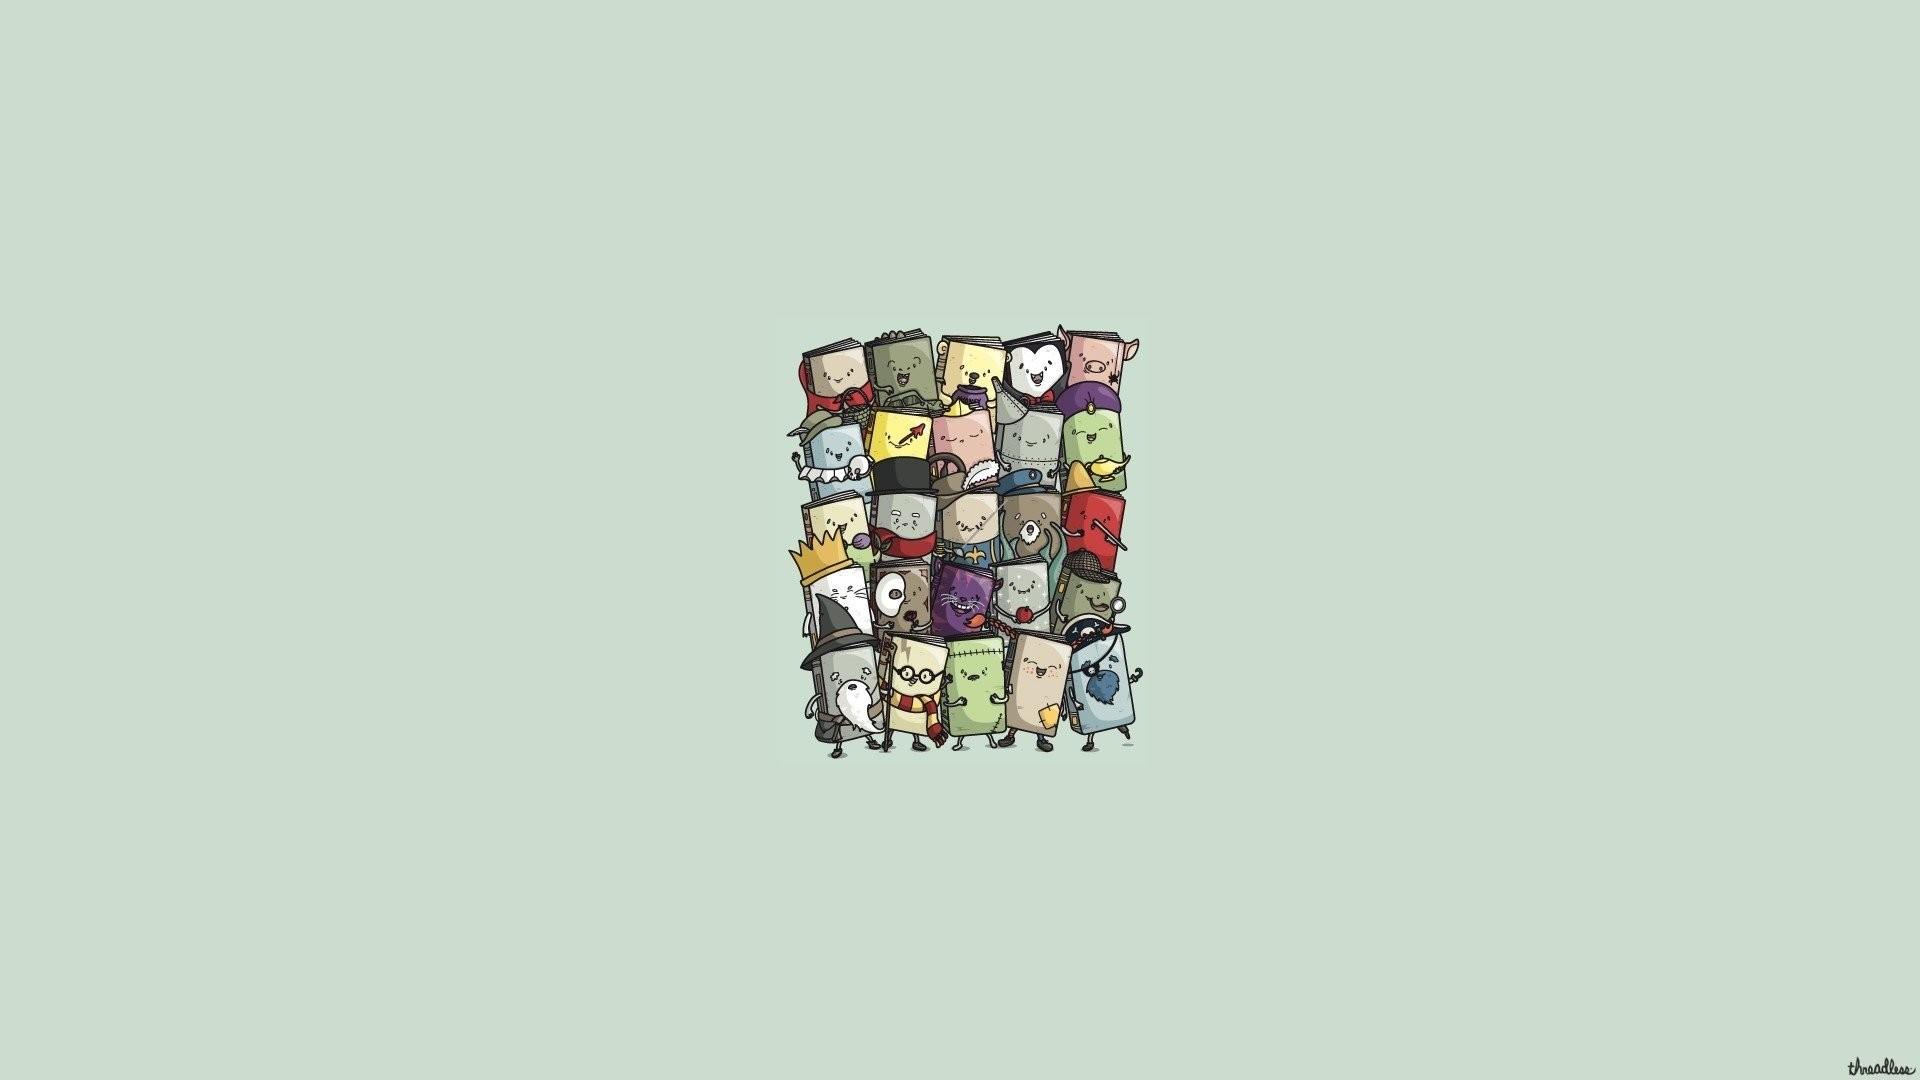 … harry potter t shirt designs walldevil …